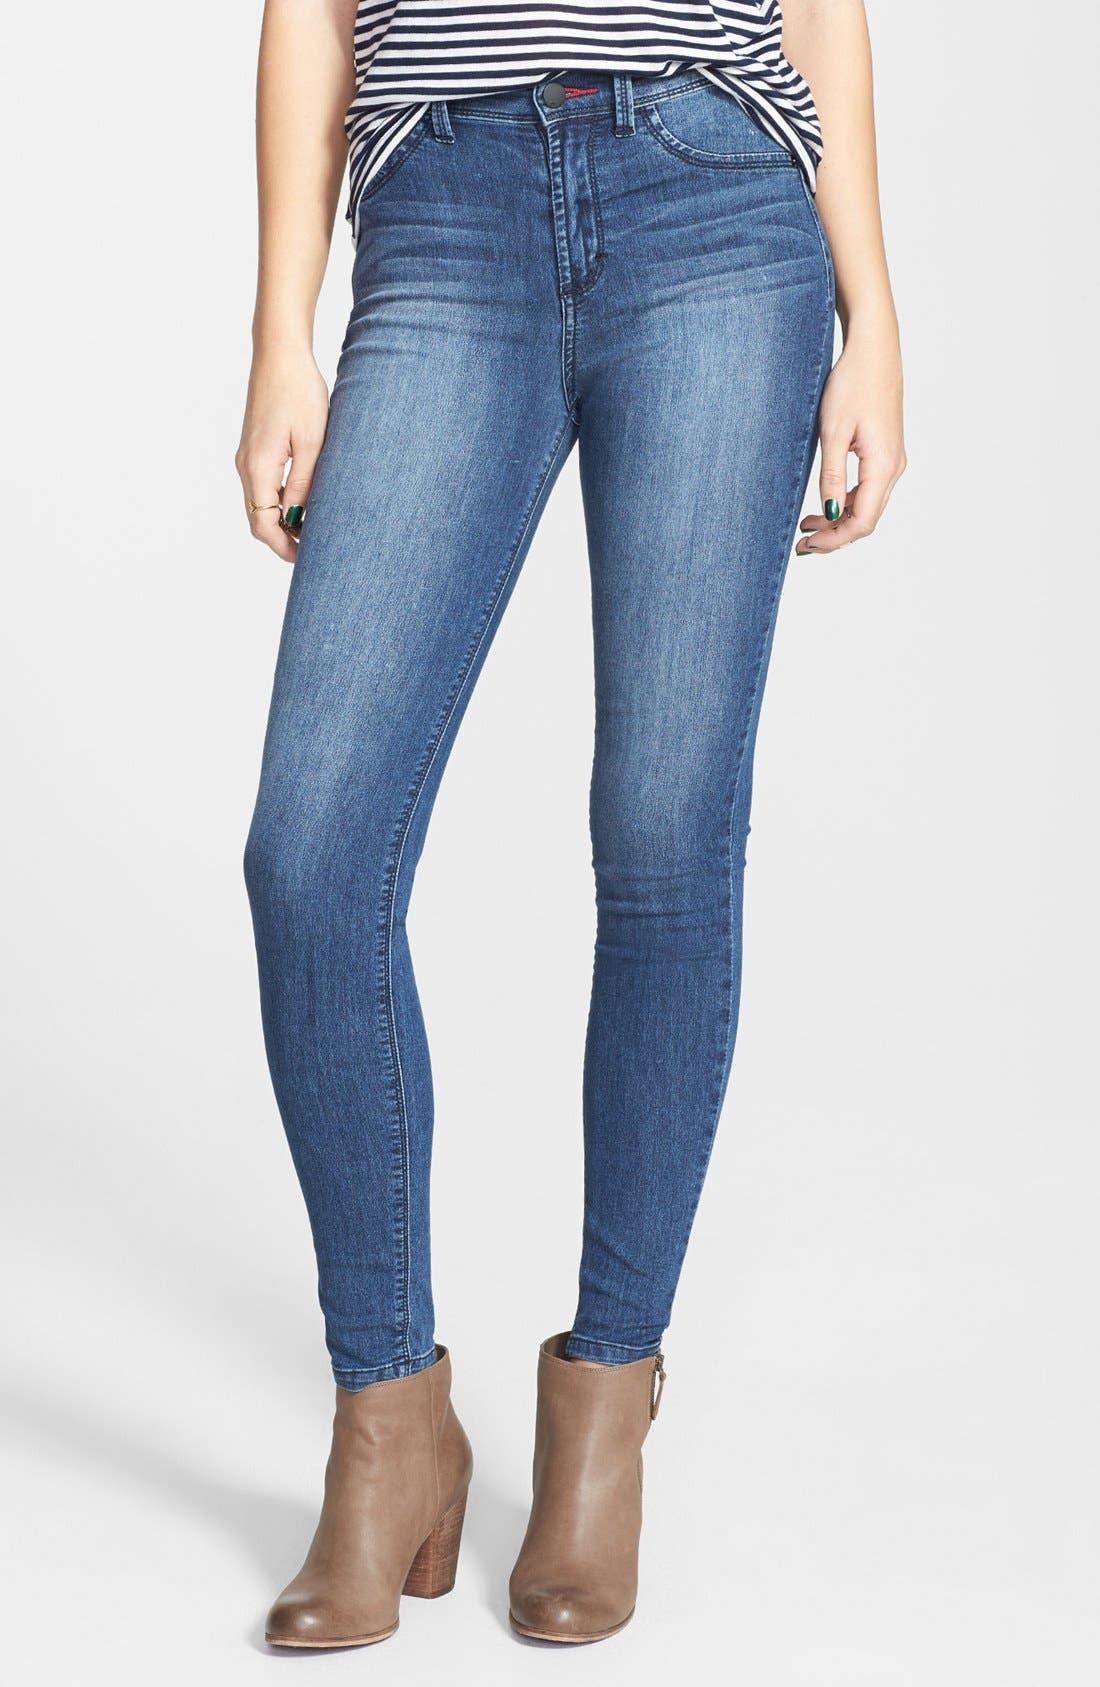 Main Image - SP Black High Waist Skinny Jeans (Medium Wash) (Juniors) (Online Only)